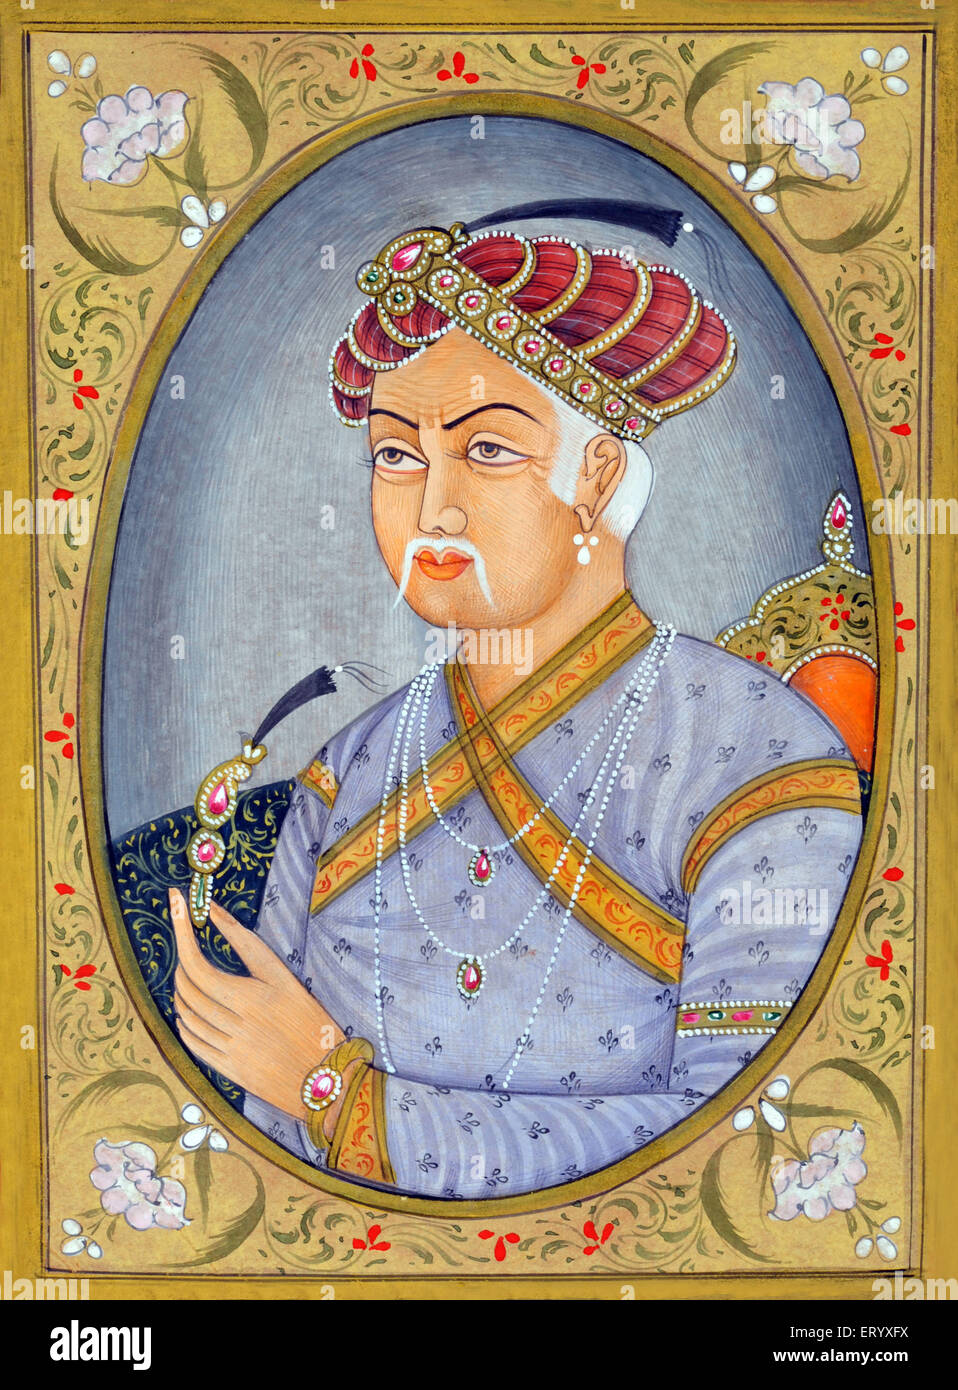 Akbar  Mughul Emperor Miniature painting - Stock Image